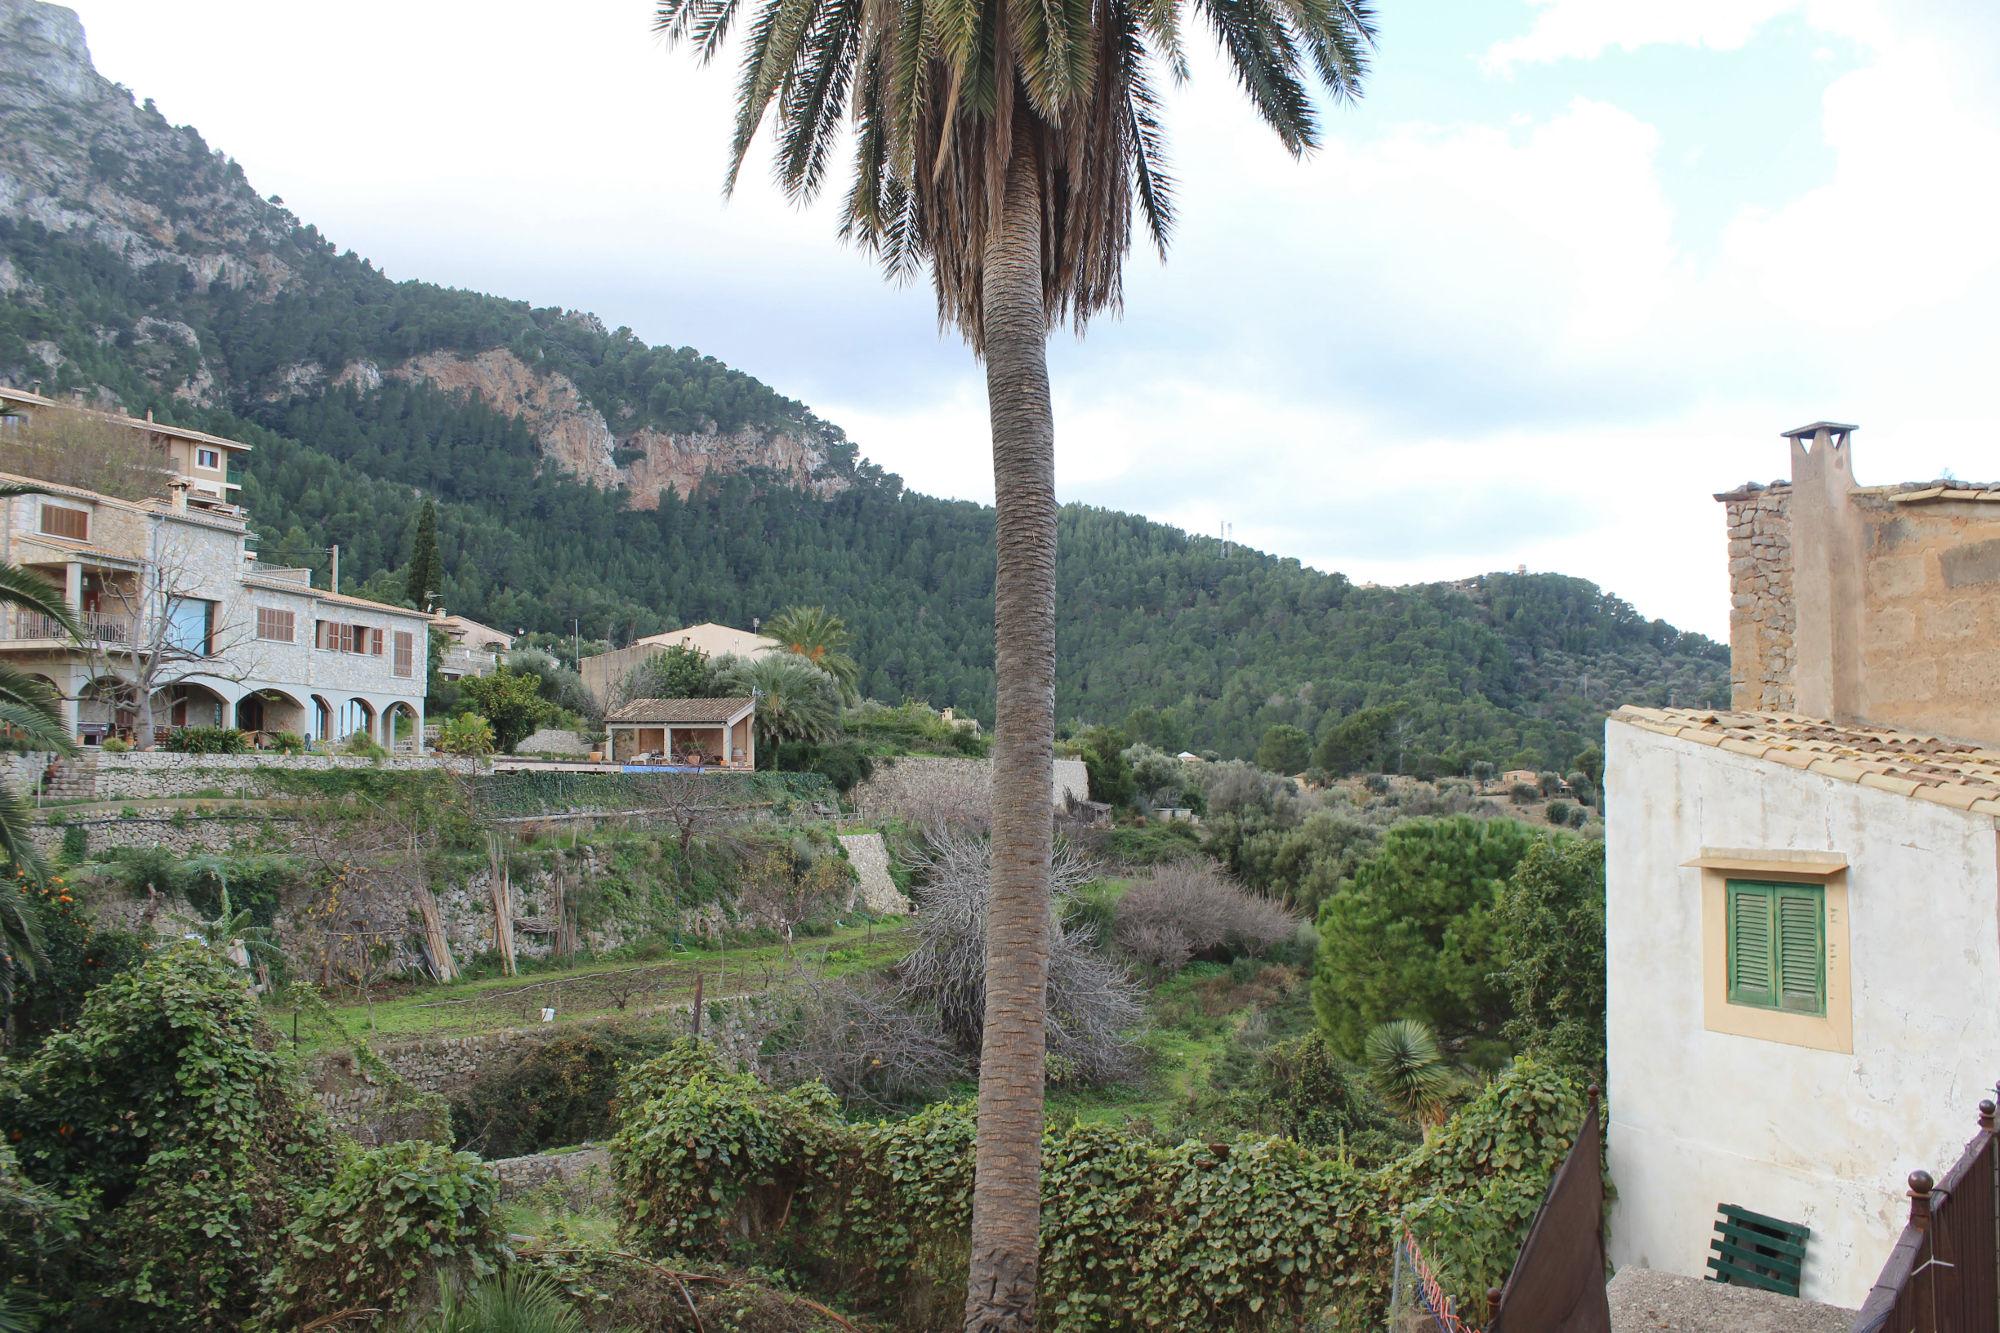 Blick auf Estellencs auf Mallorca